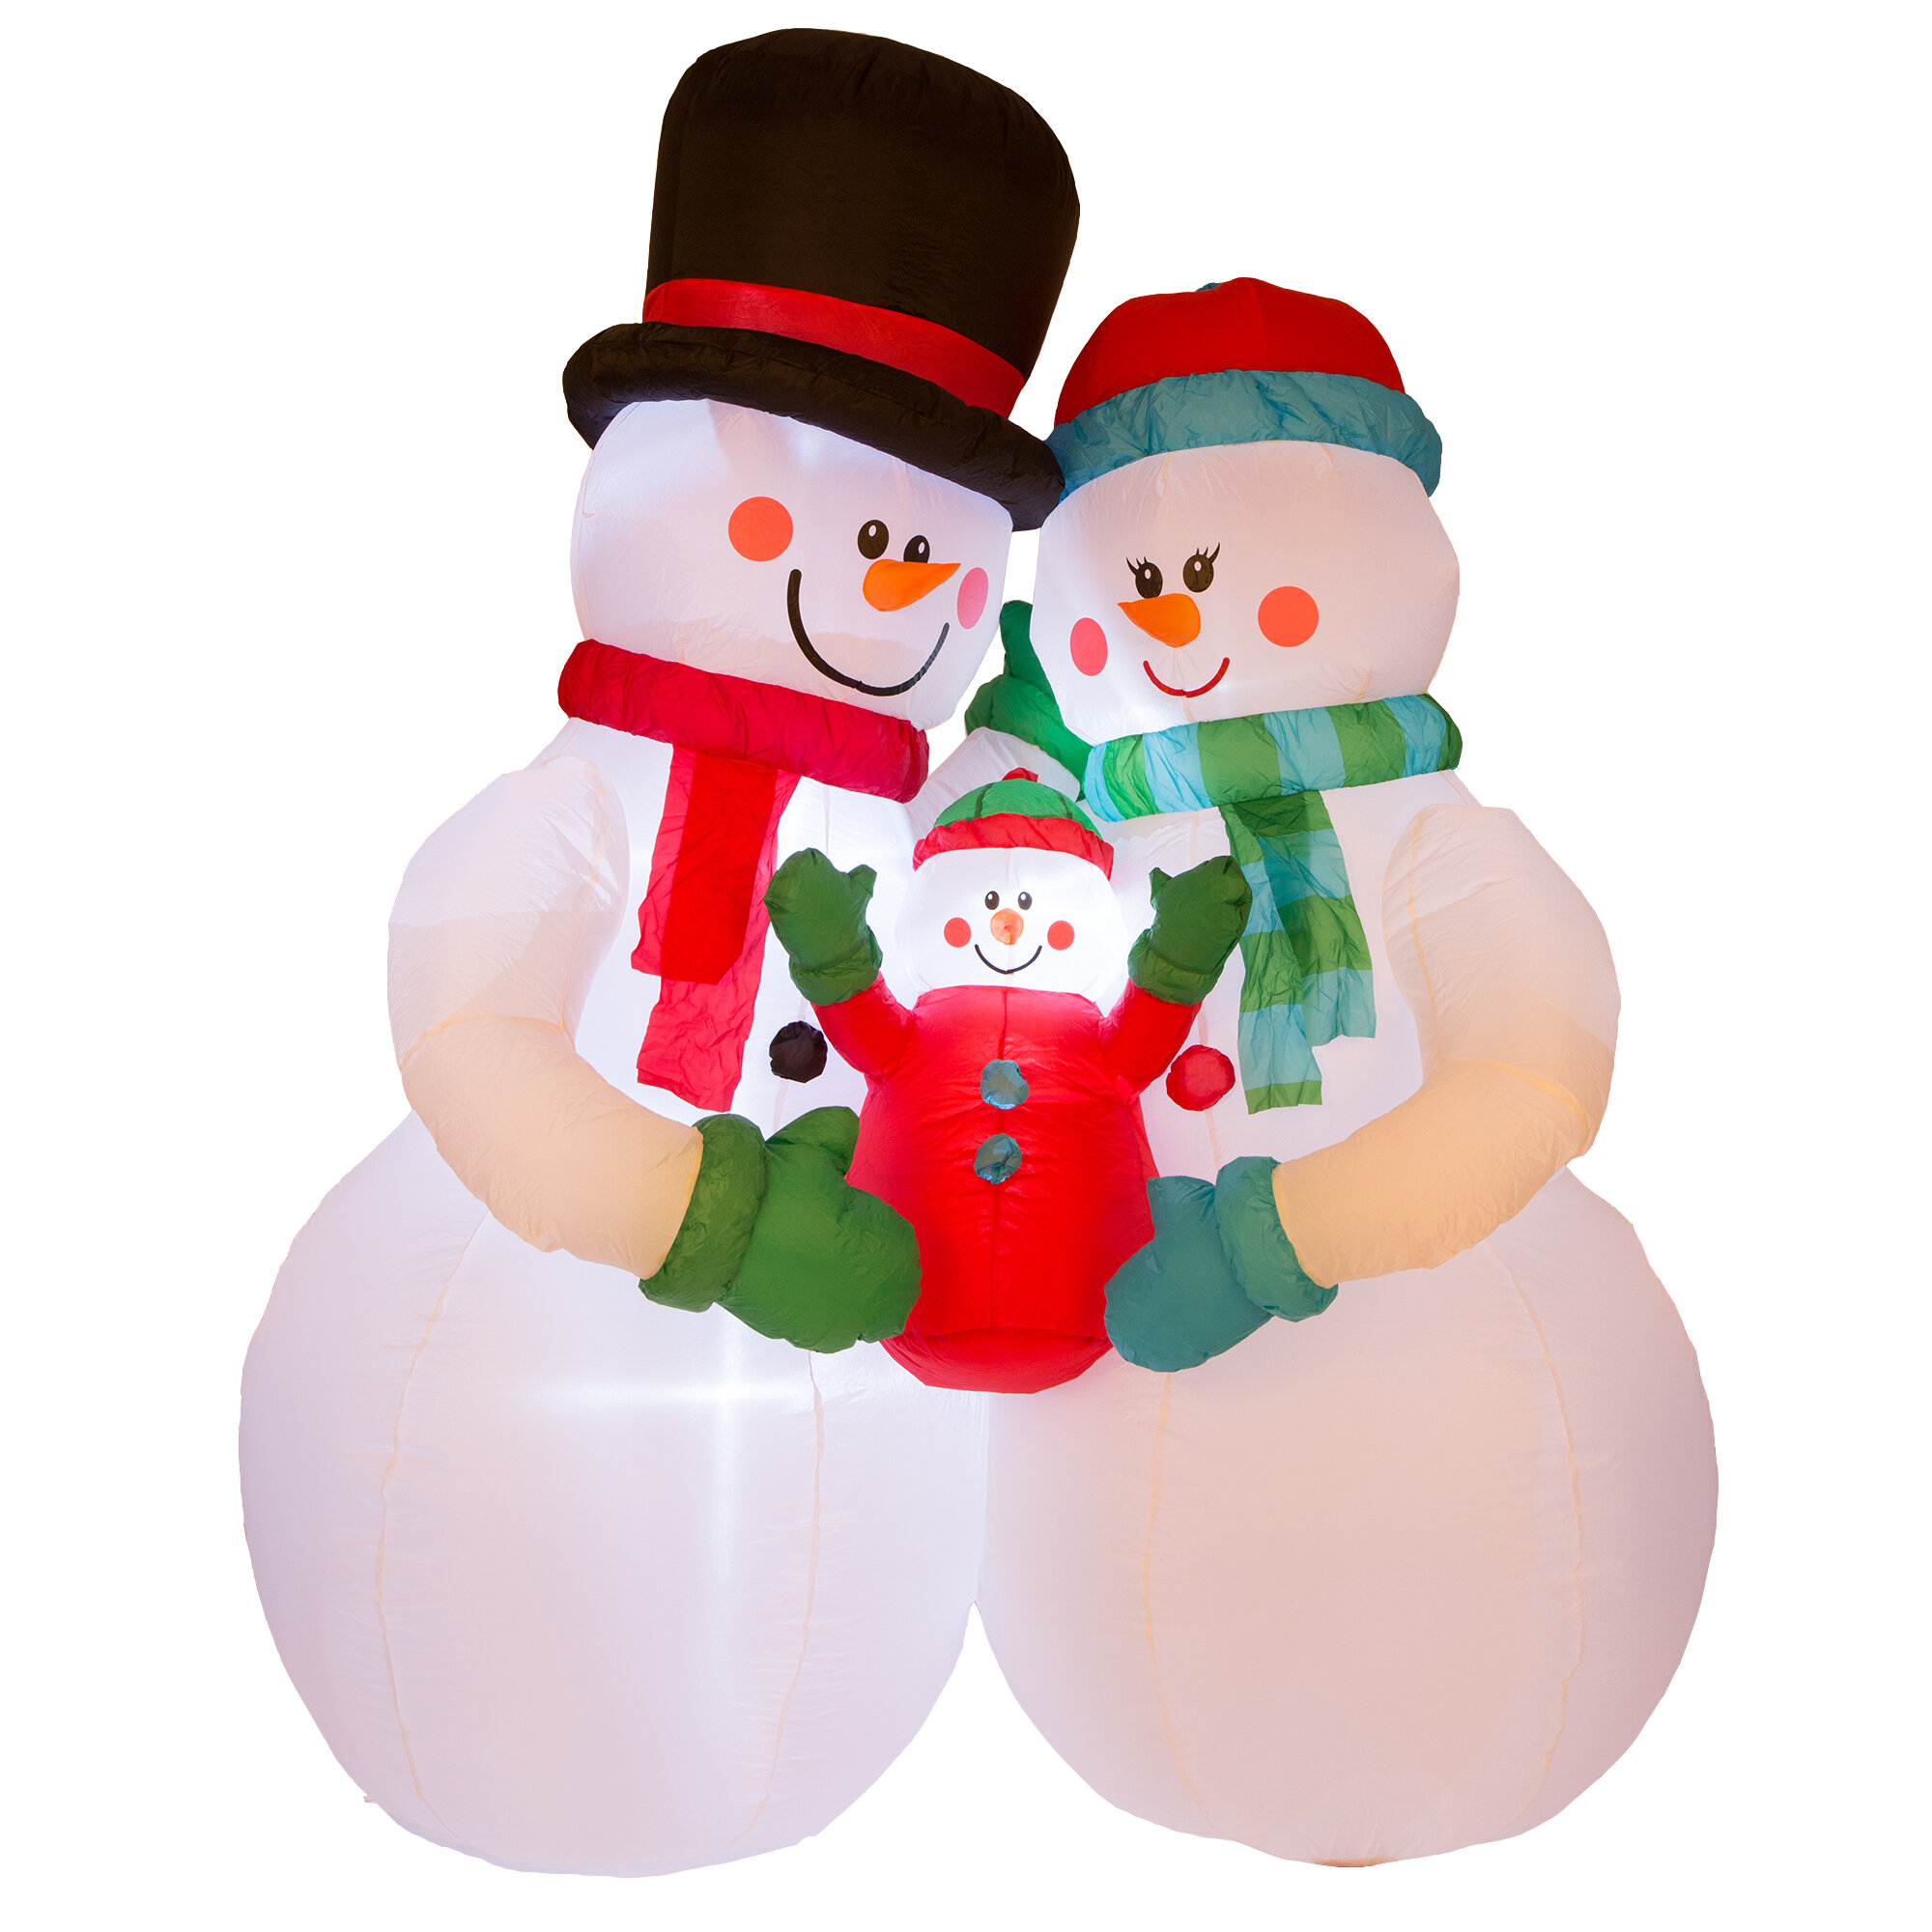 Glitzhome Lighted Snowman Family Decor Inflatable & Reviews | Wayfair